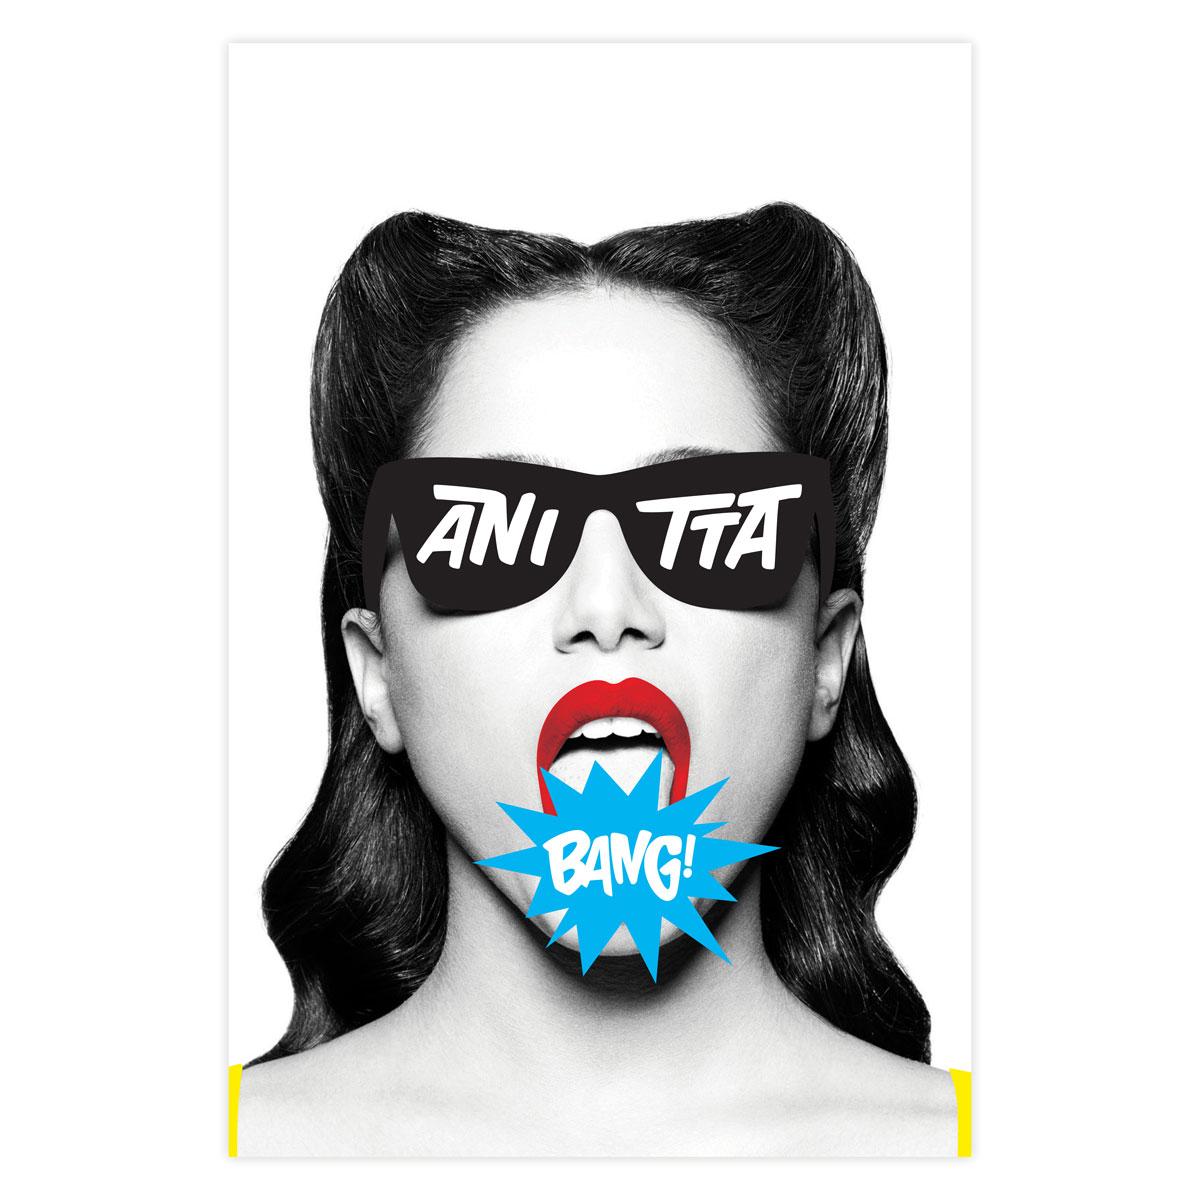 Pôster Anitta Bang!